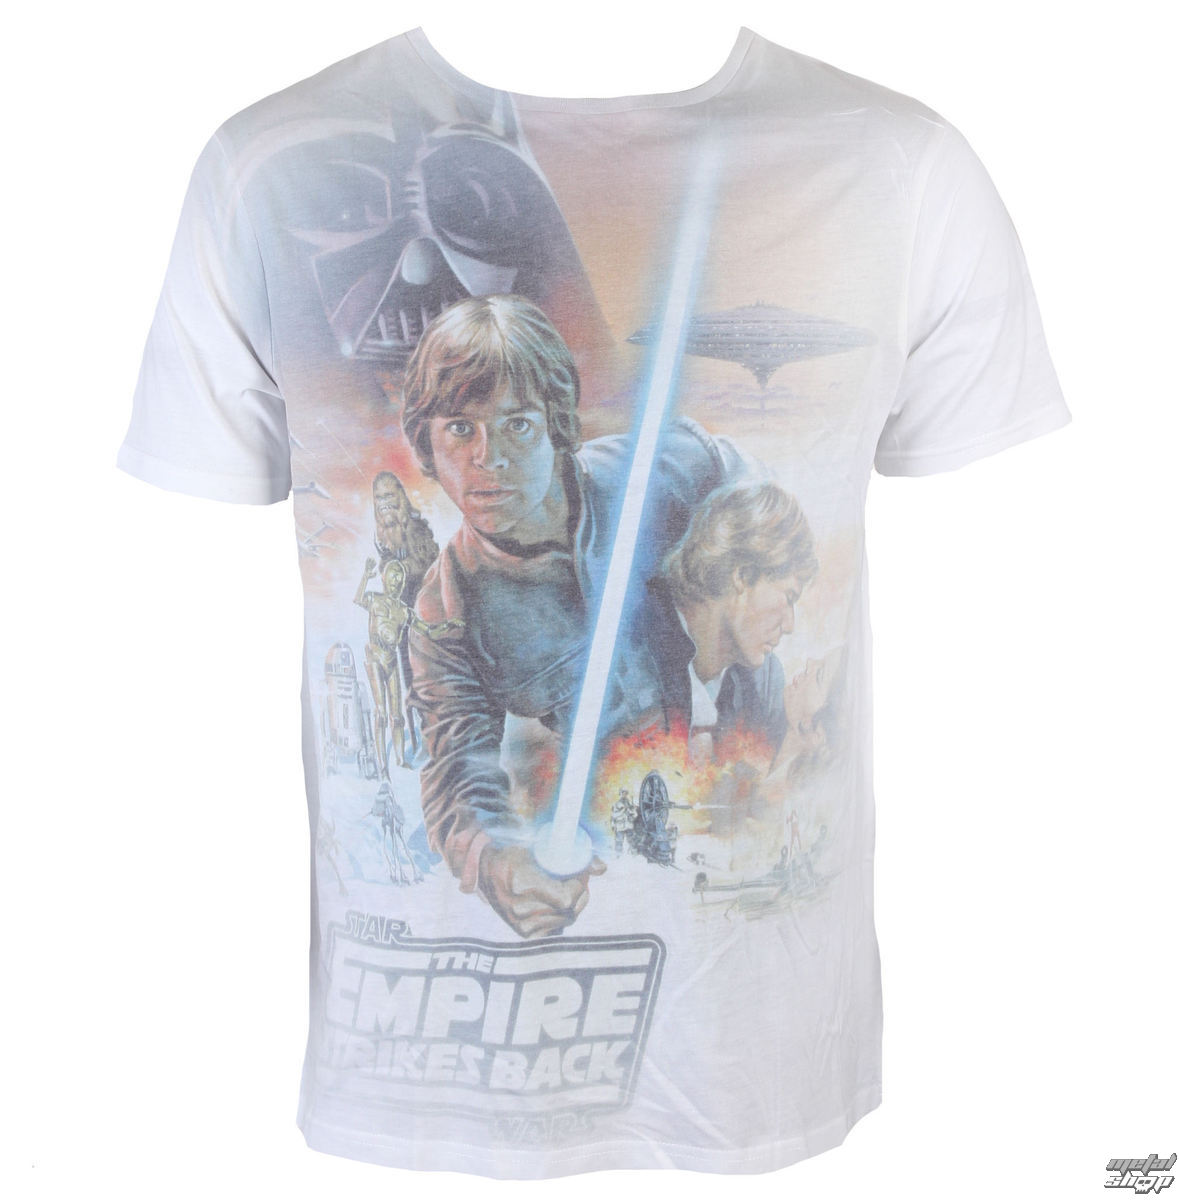 Star Wars Mens Darth Vader /& Luke Skywalker Fighting Shirt NWT M